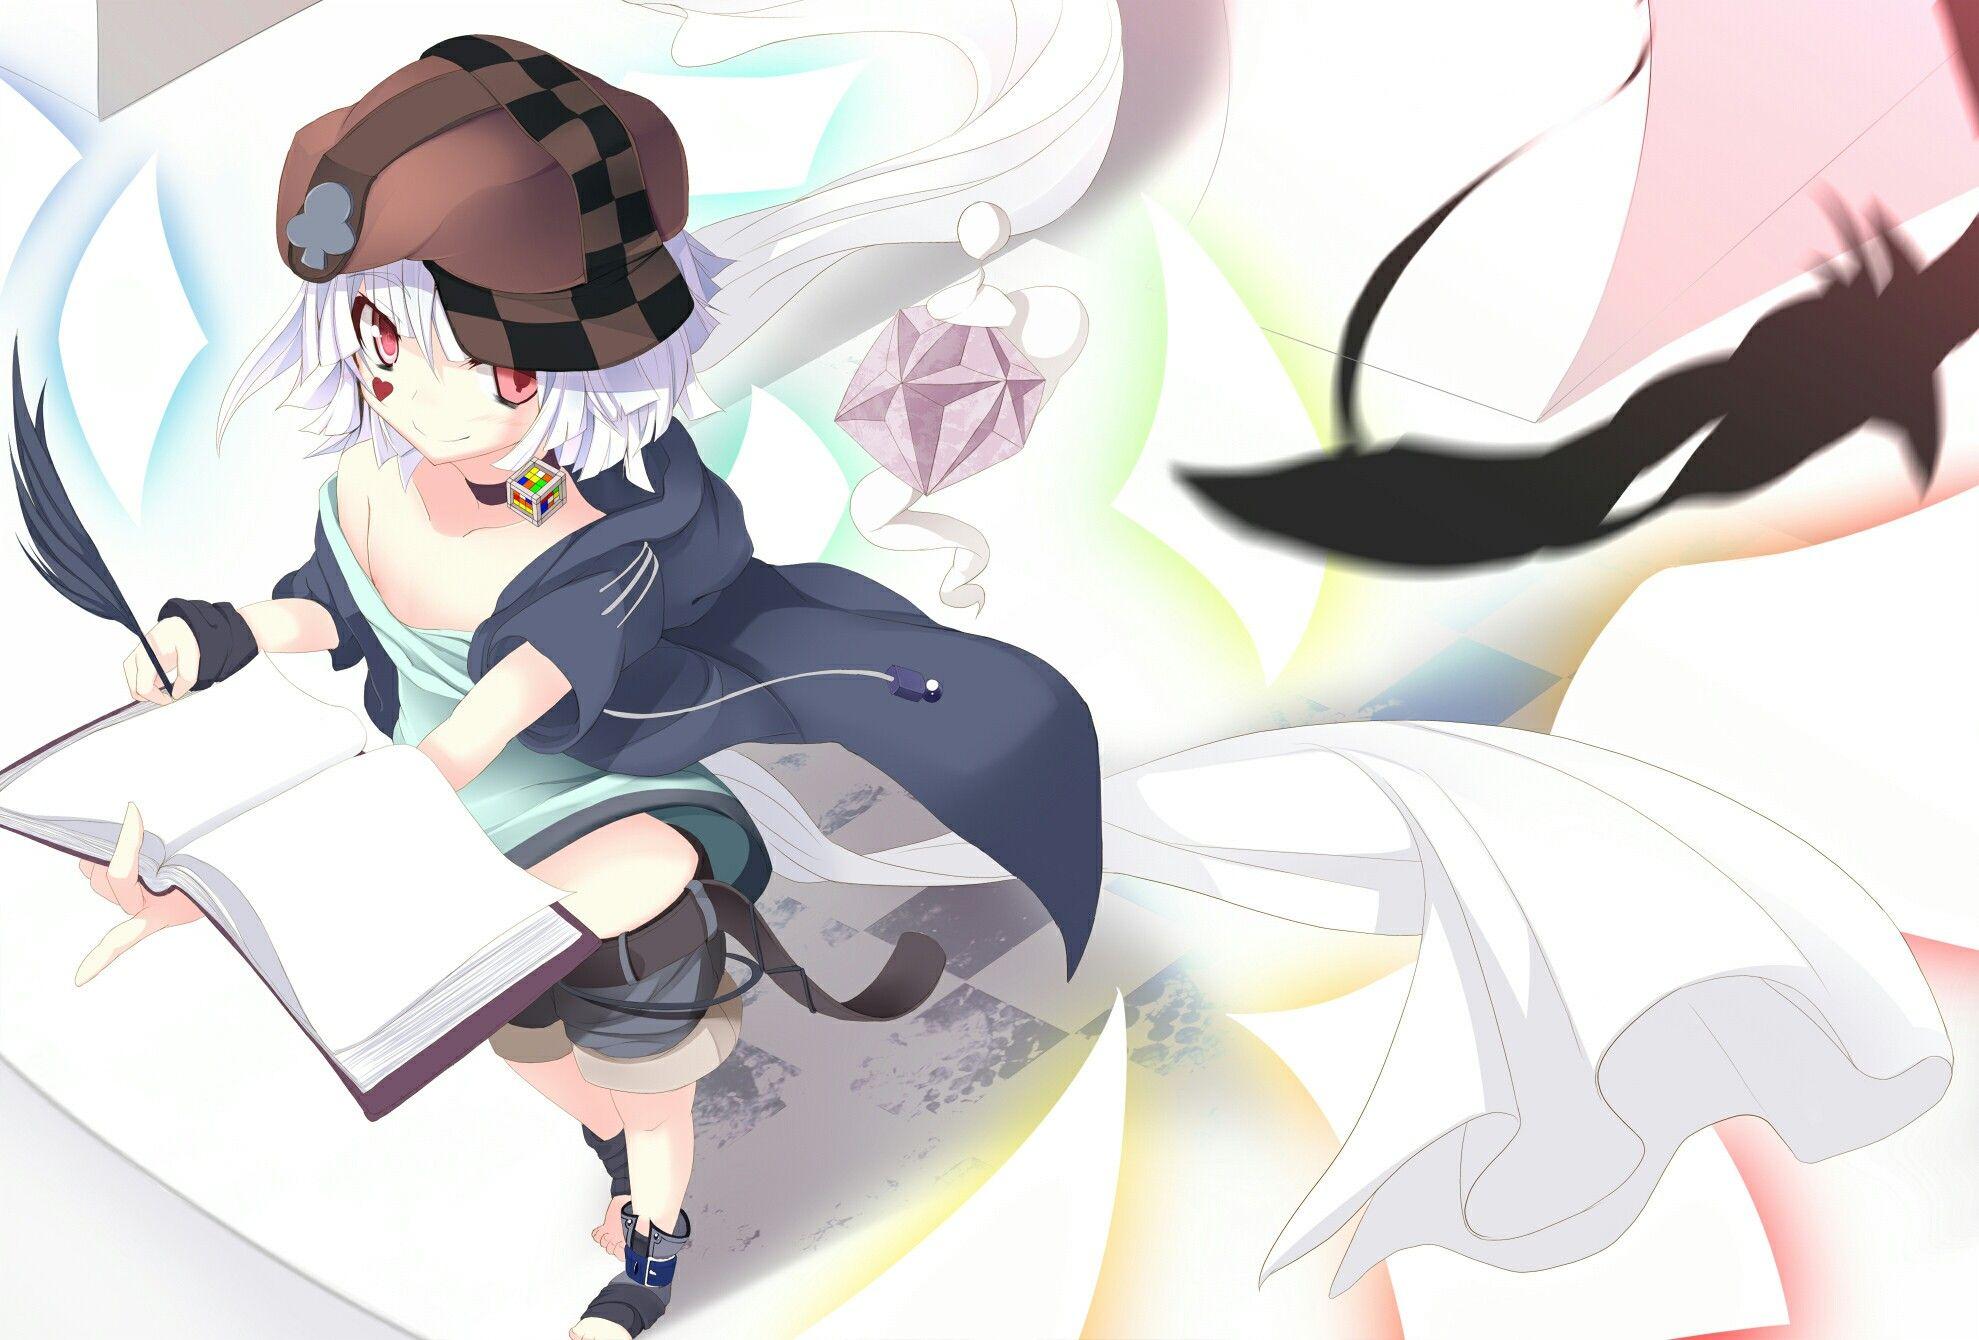 Pin De 秋 Em ノーゲーム ノーライフ Anime Game No Life